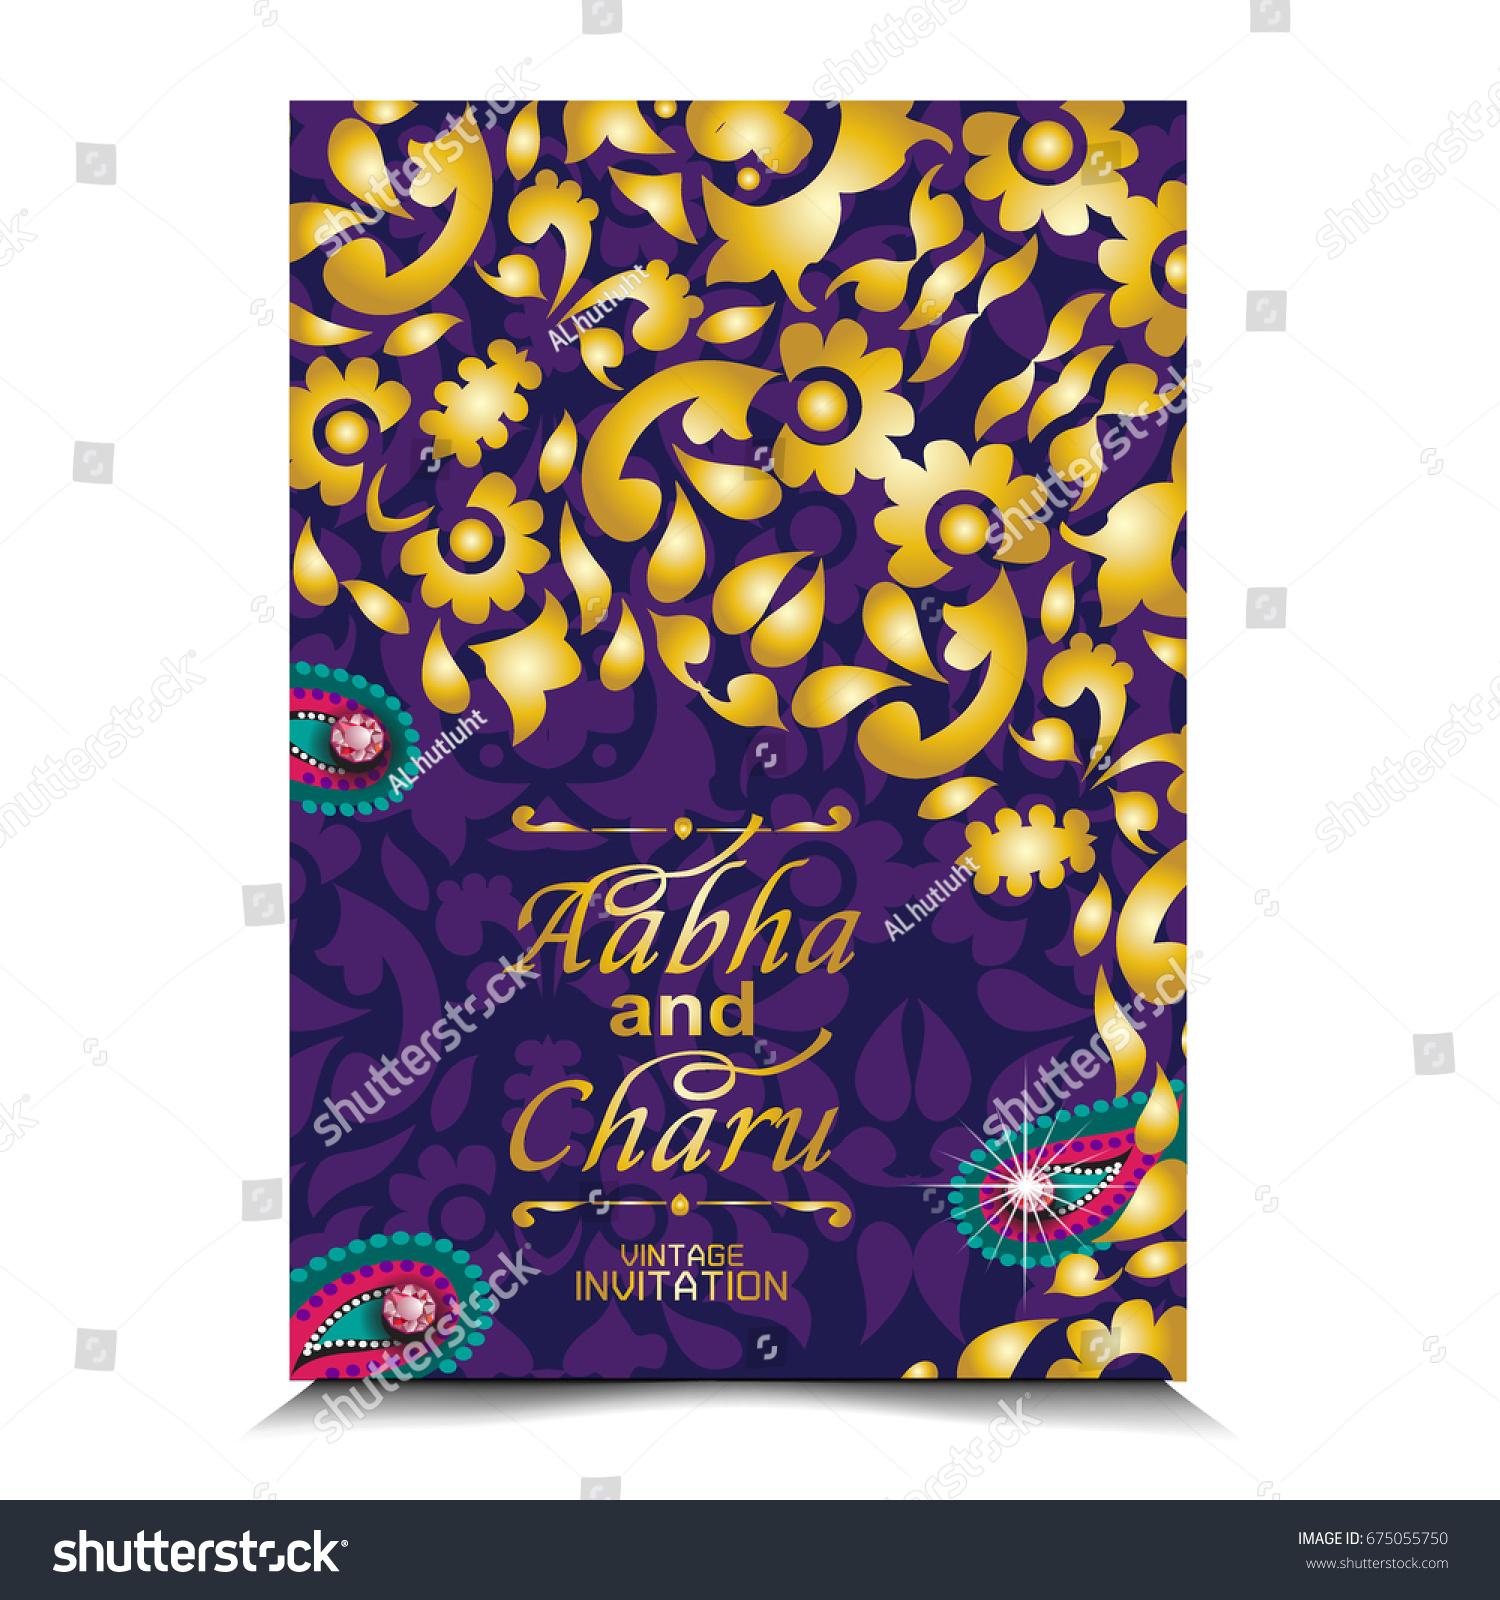 Vector Illustration Indian Wedding Invitation Card Stock Vector